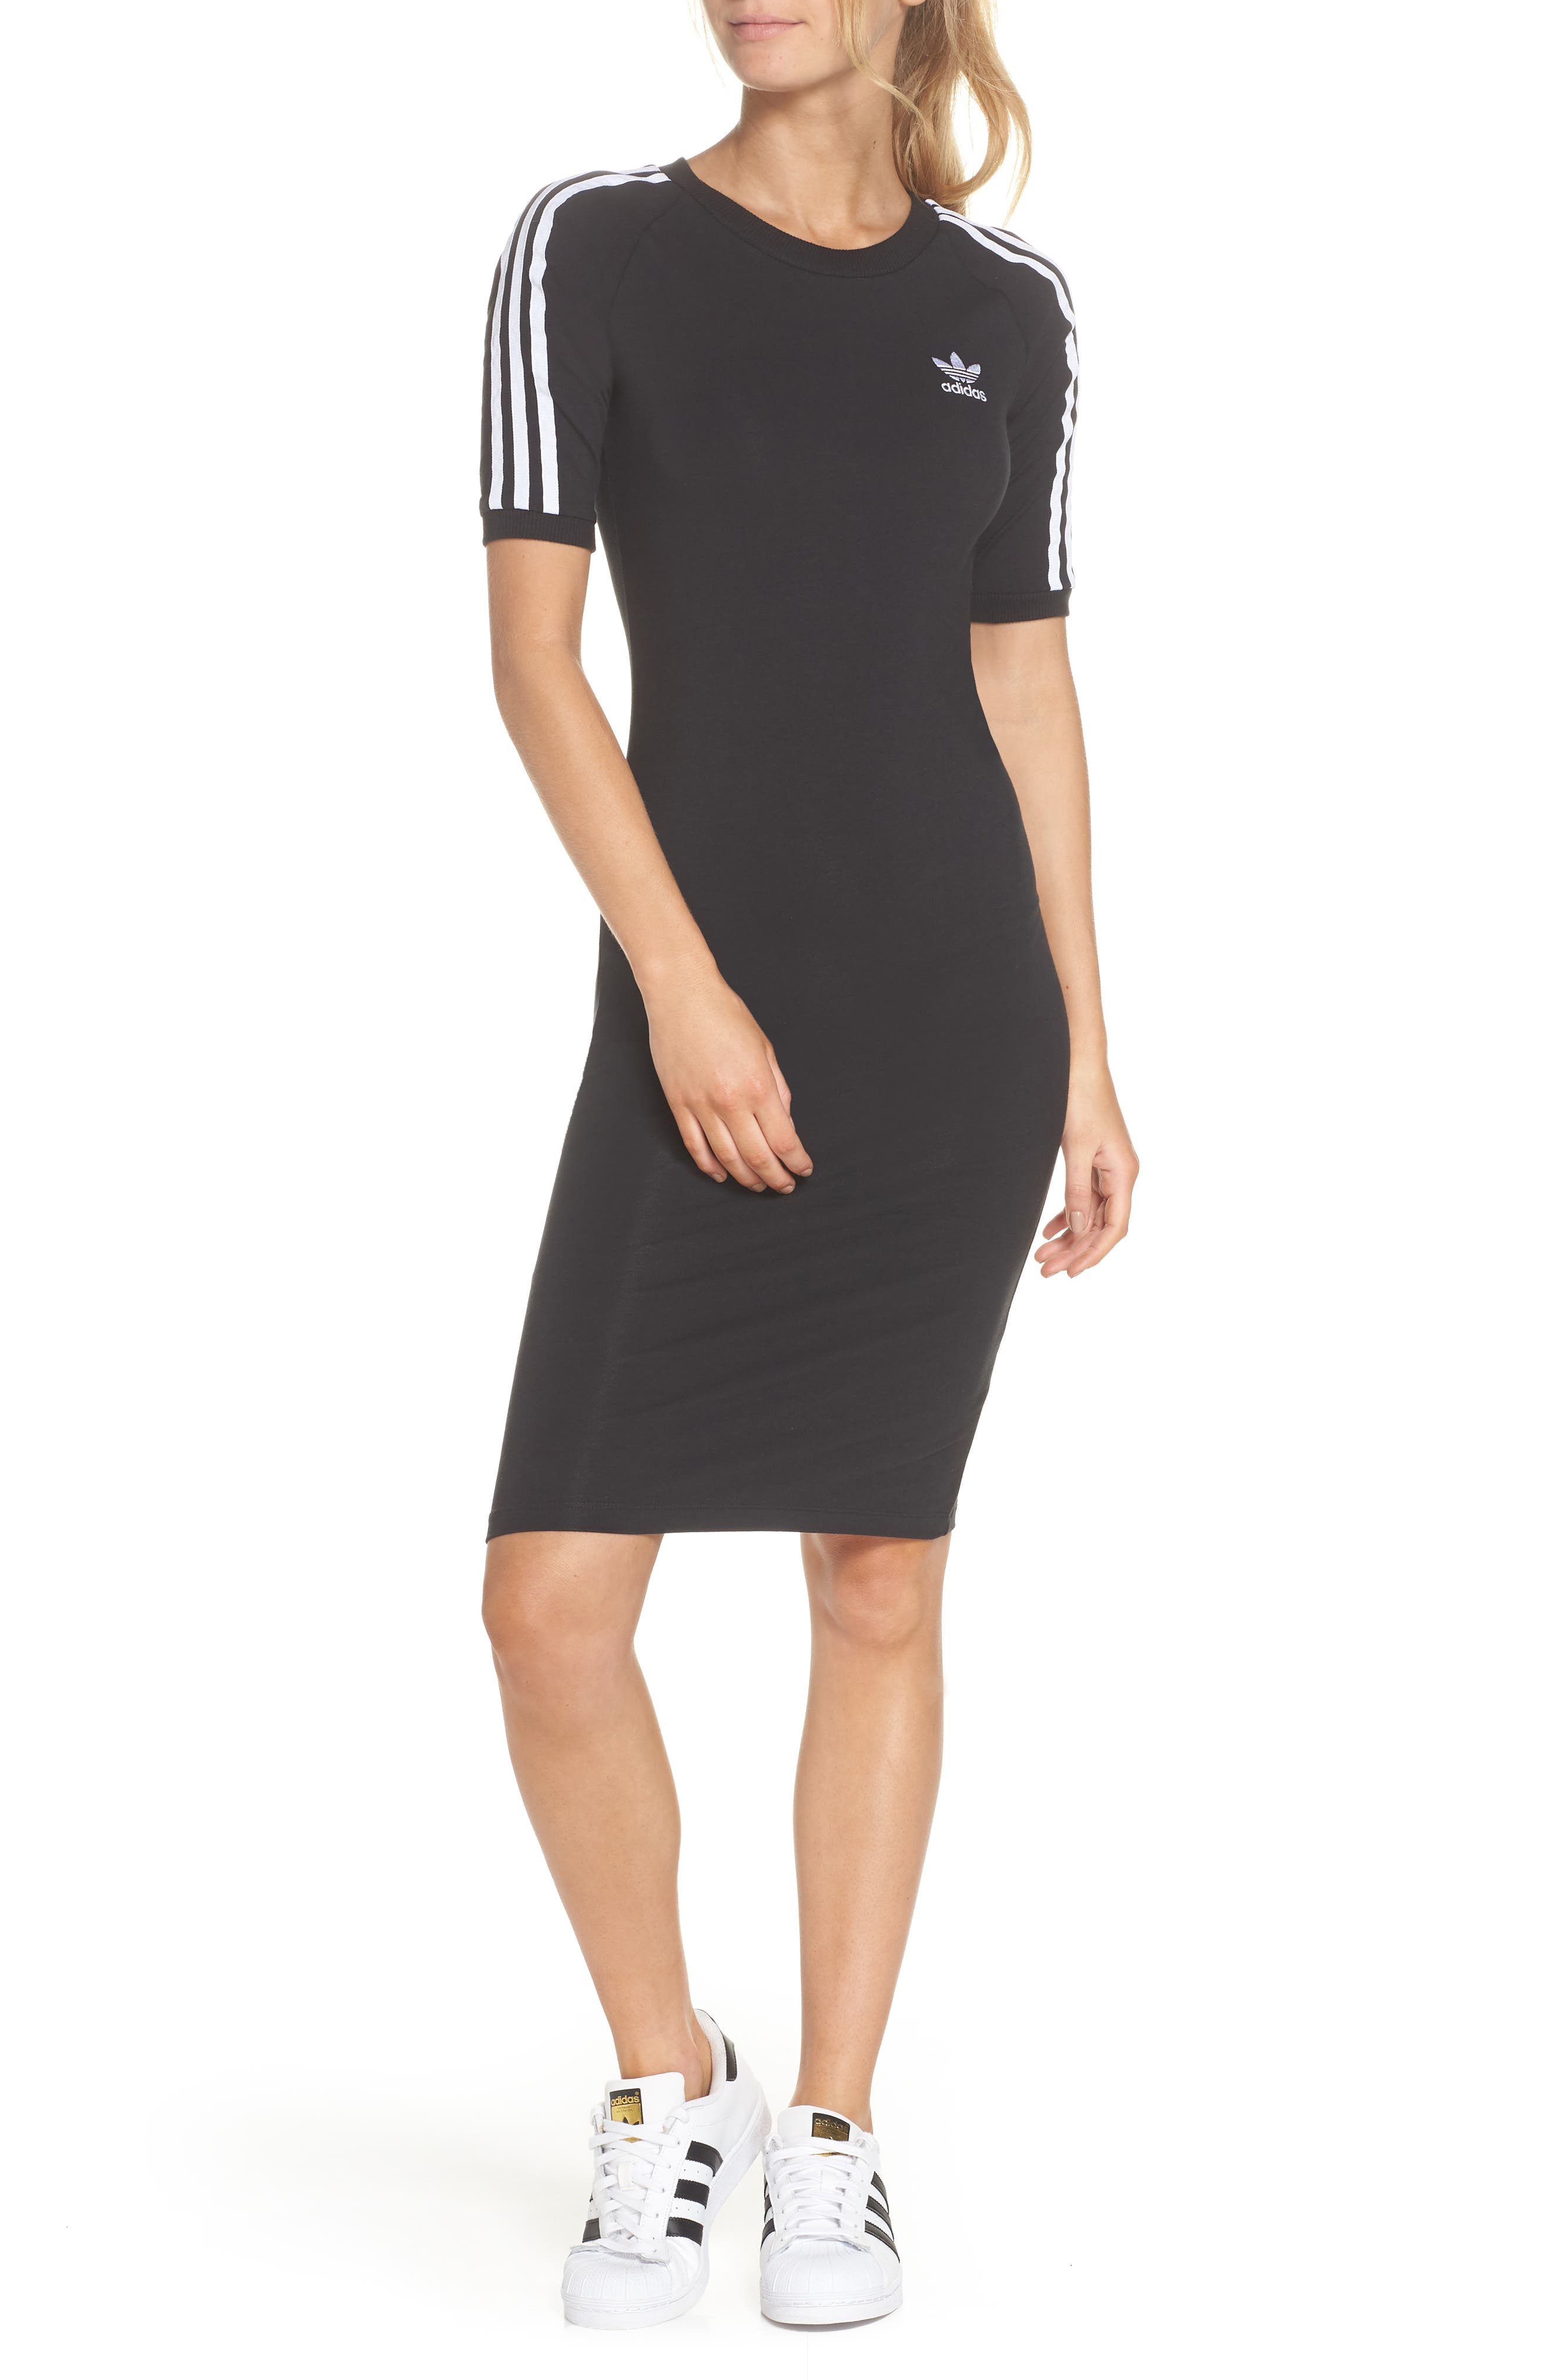 adidas 3-Stripes Dress